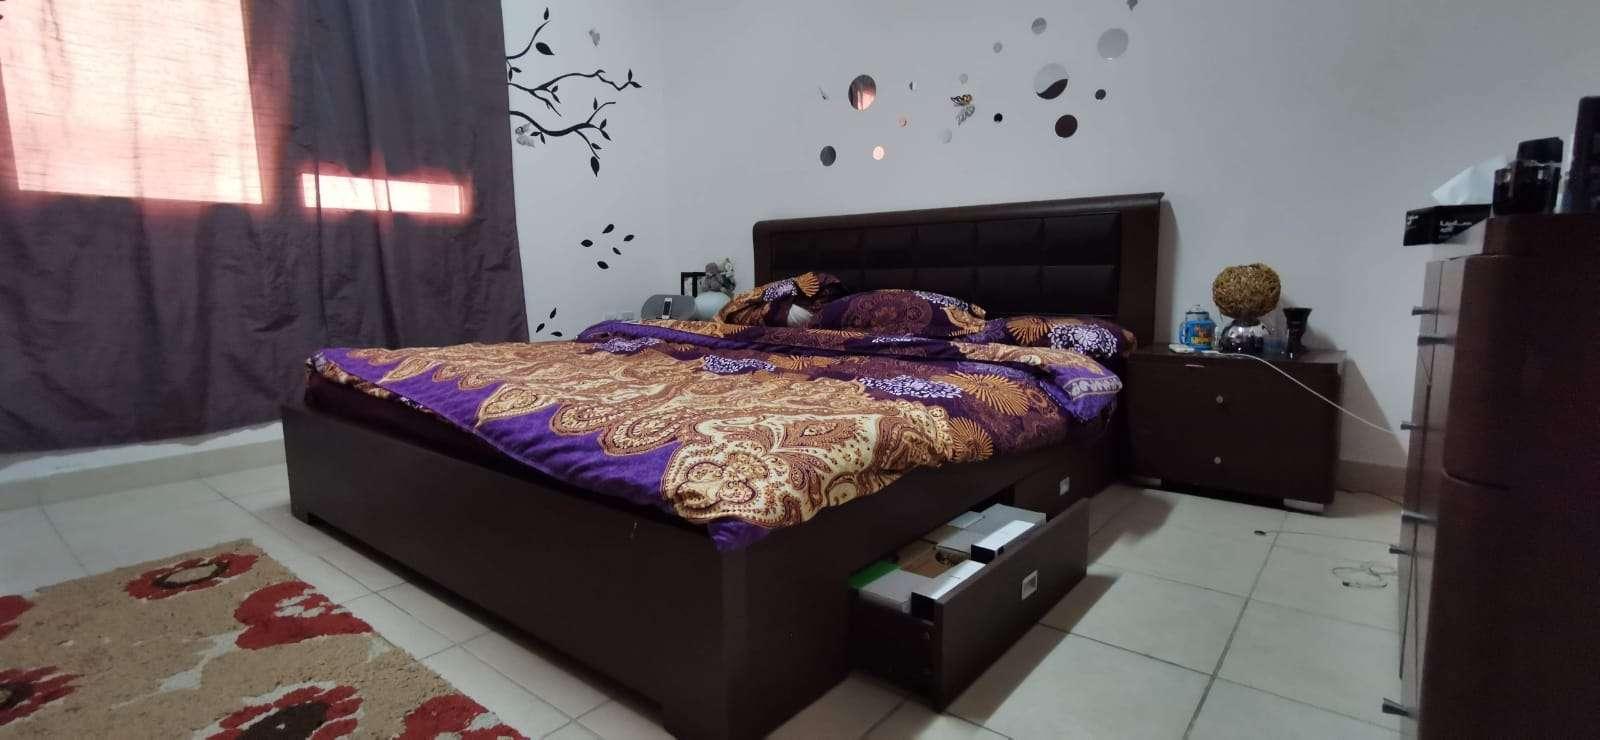 Full bedroom set and mattress